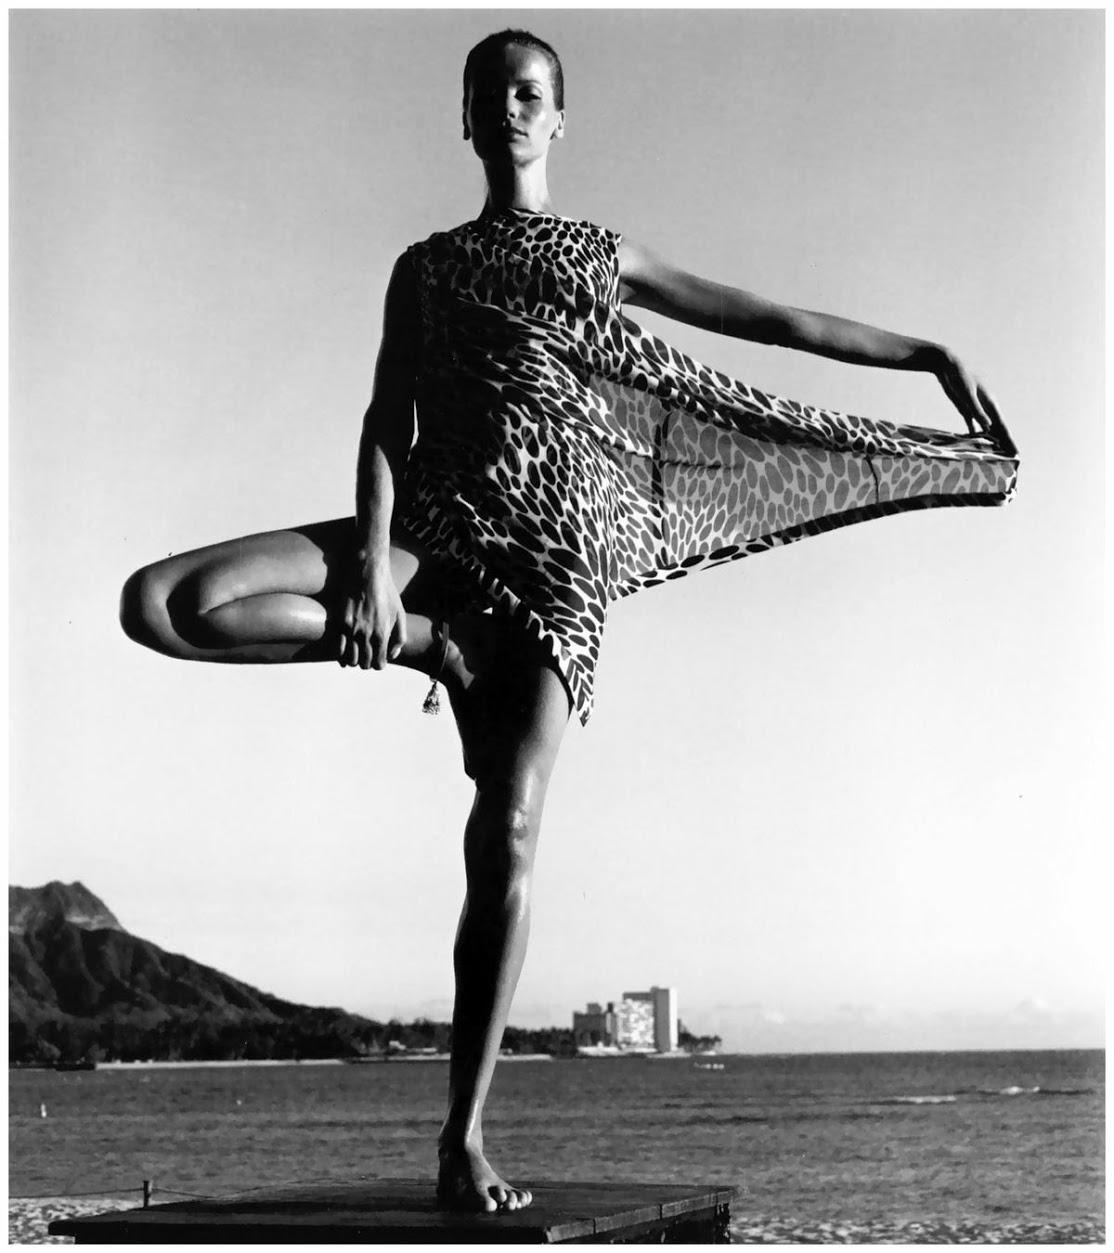 Fashion model Veruschka in Tree Pose. 1960s.